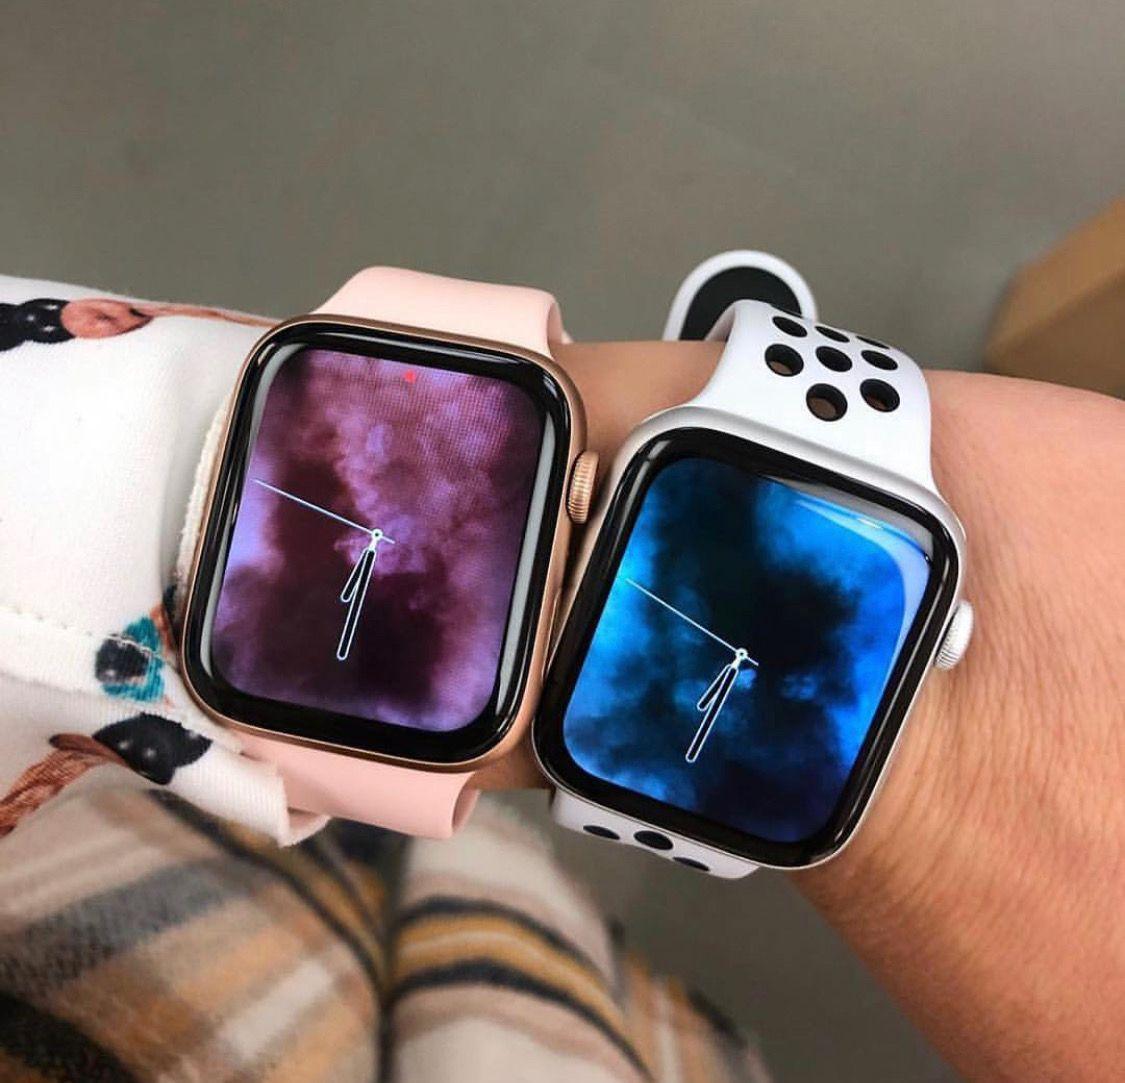 Pin by 𝕀𝕔𝕜𝕪 𝕍𝕚𝕔𝕜𝕪 on ♡ tє¢ниσℓσgу ♡ in 2019 Apple, Apple